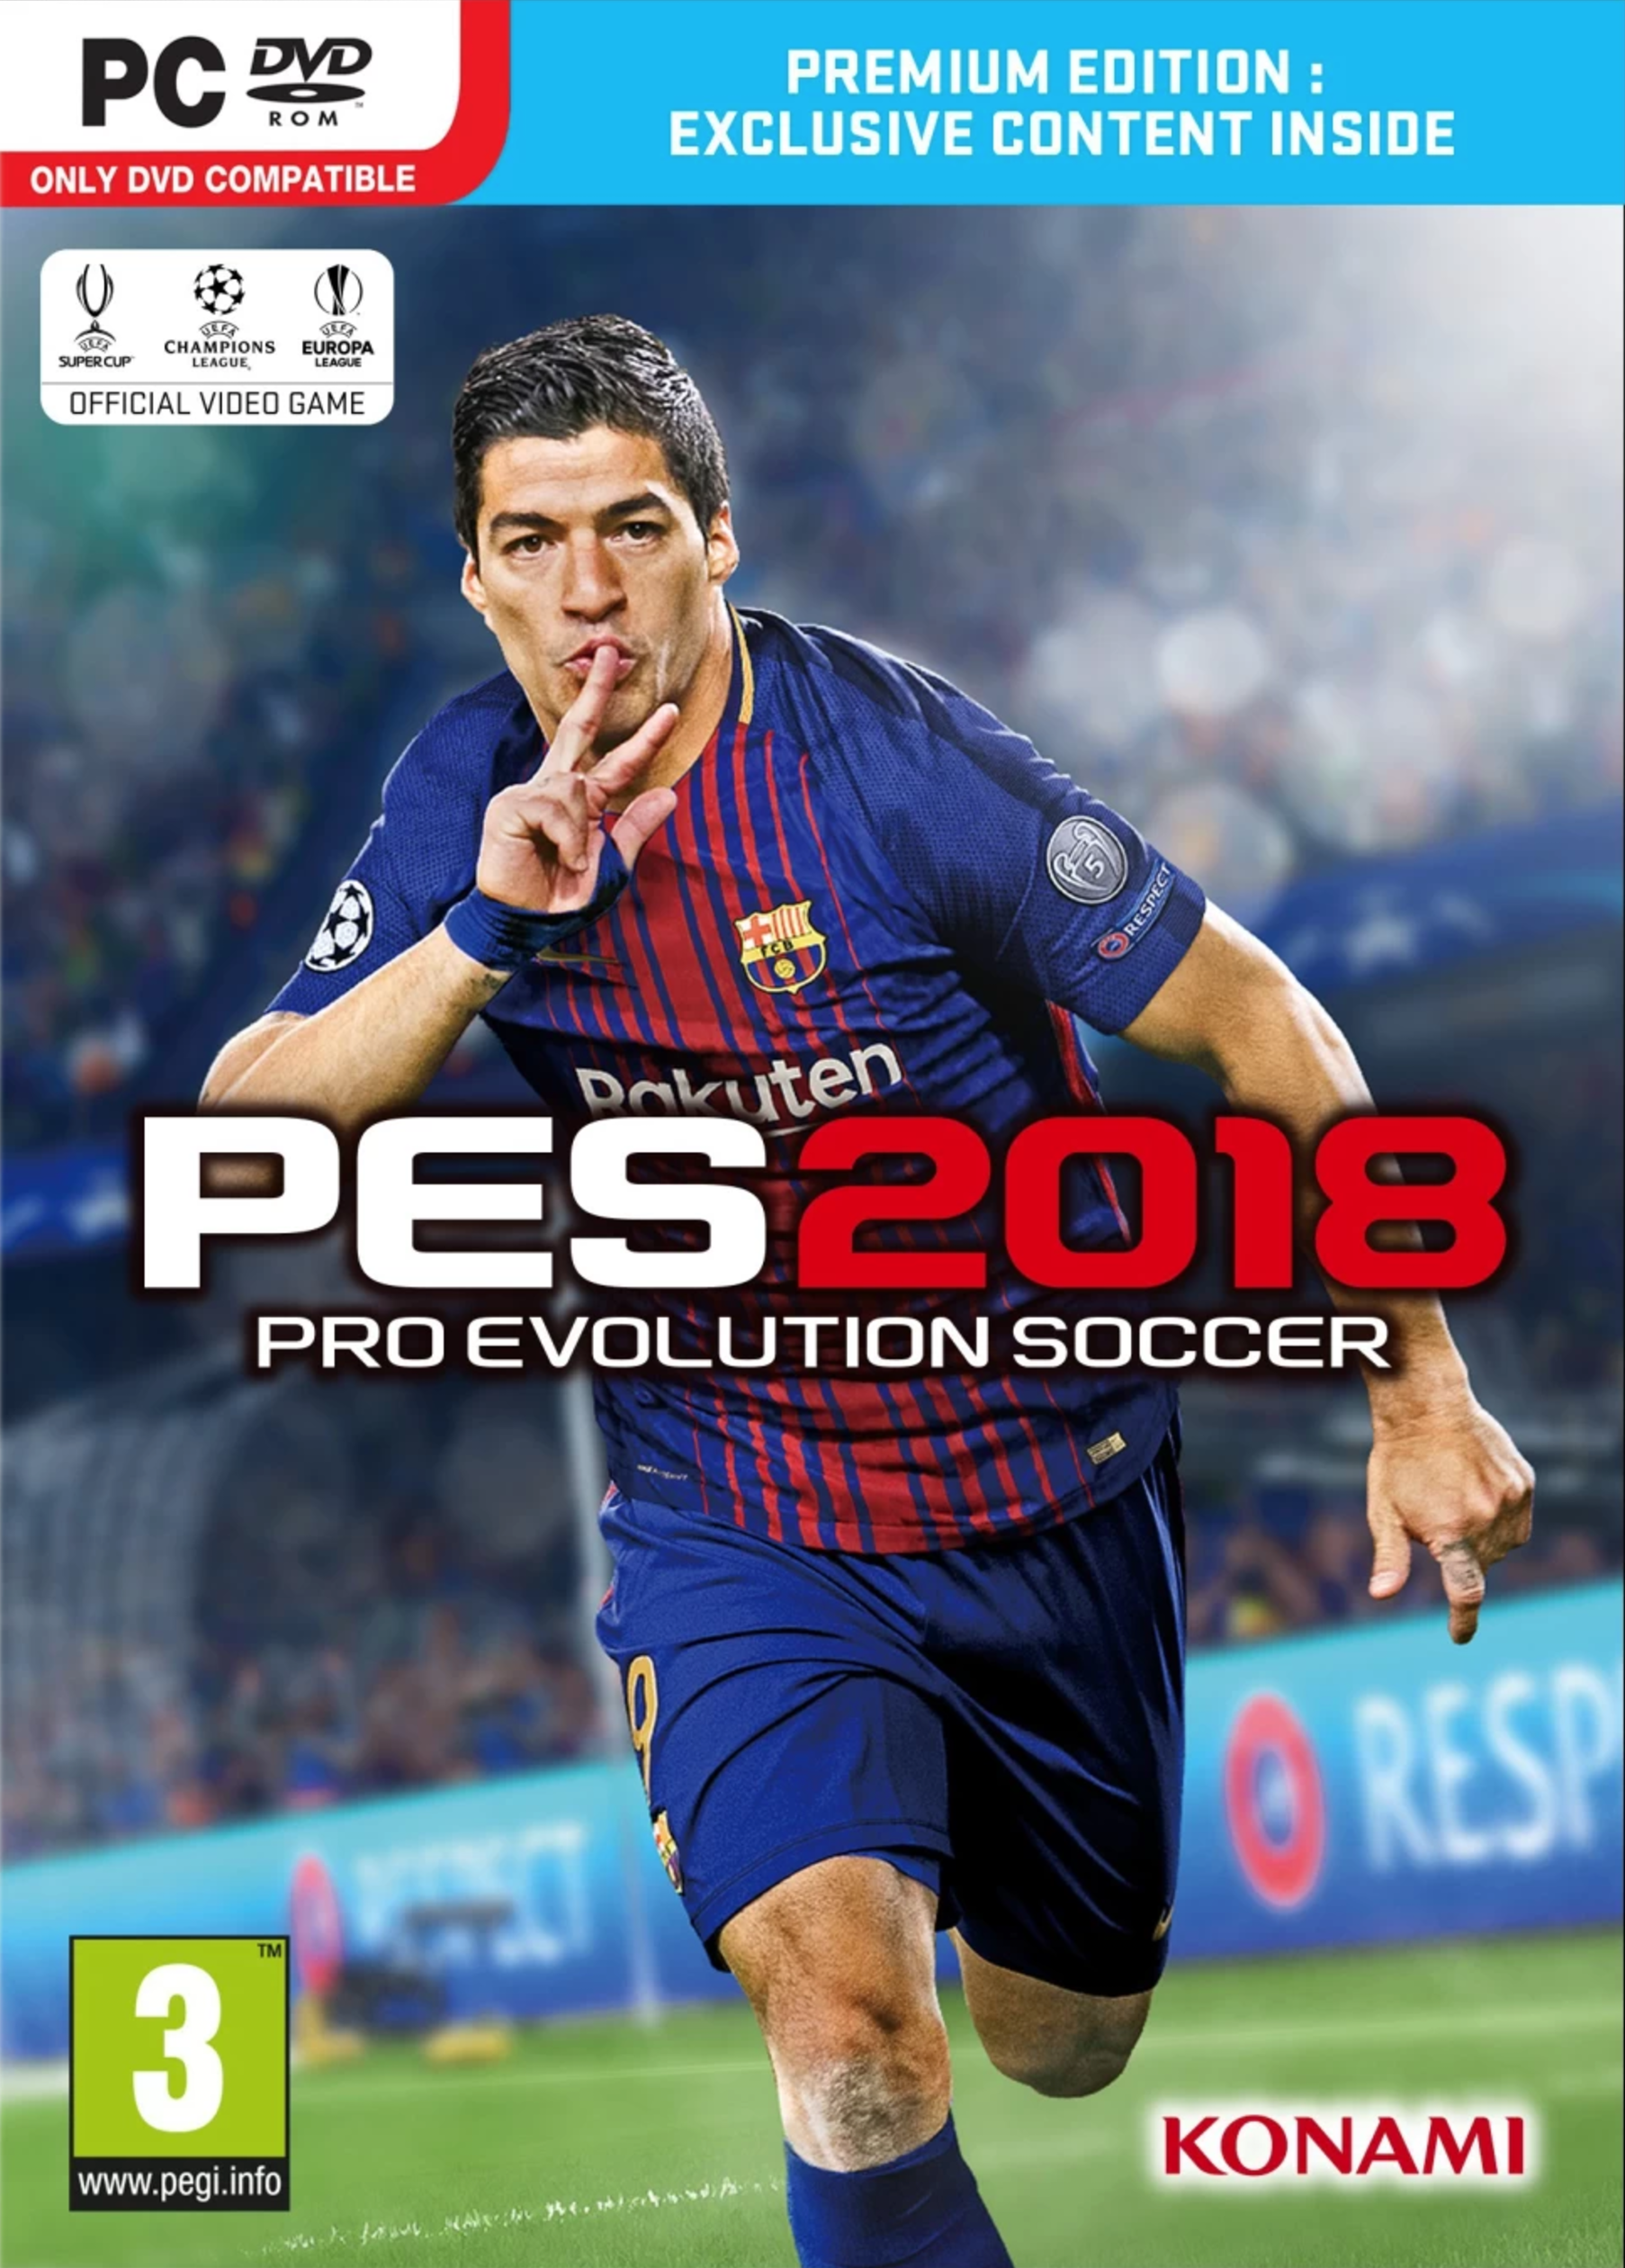 Pro Evolution Soccer (PES) 2018 - Premium Edition PC